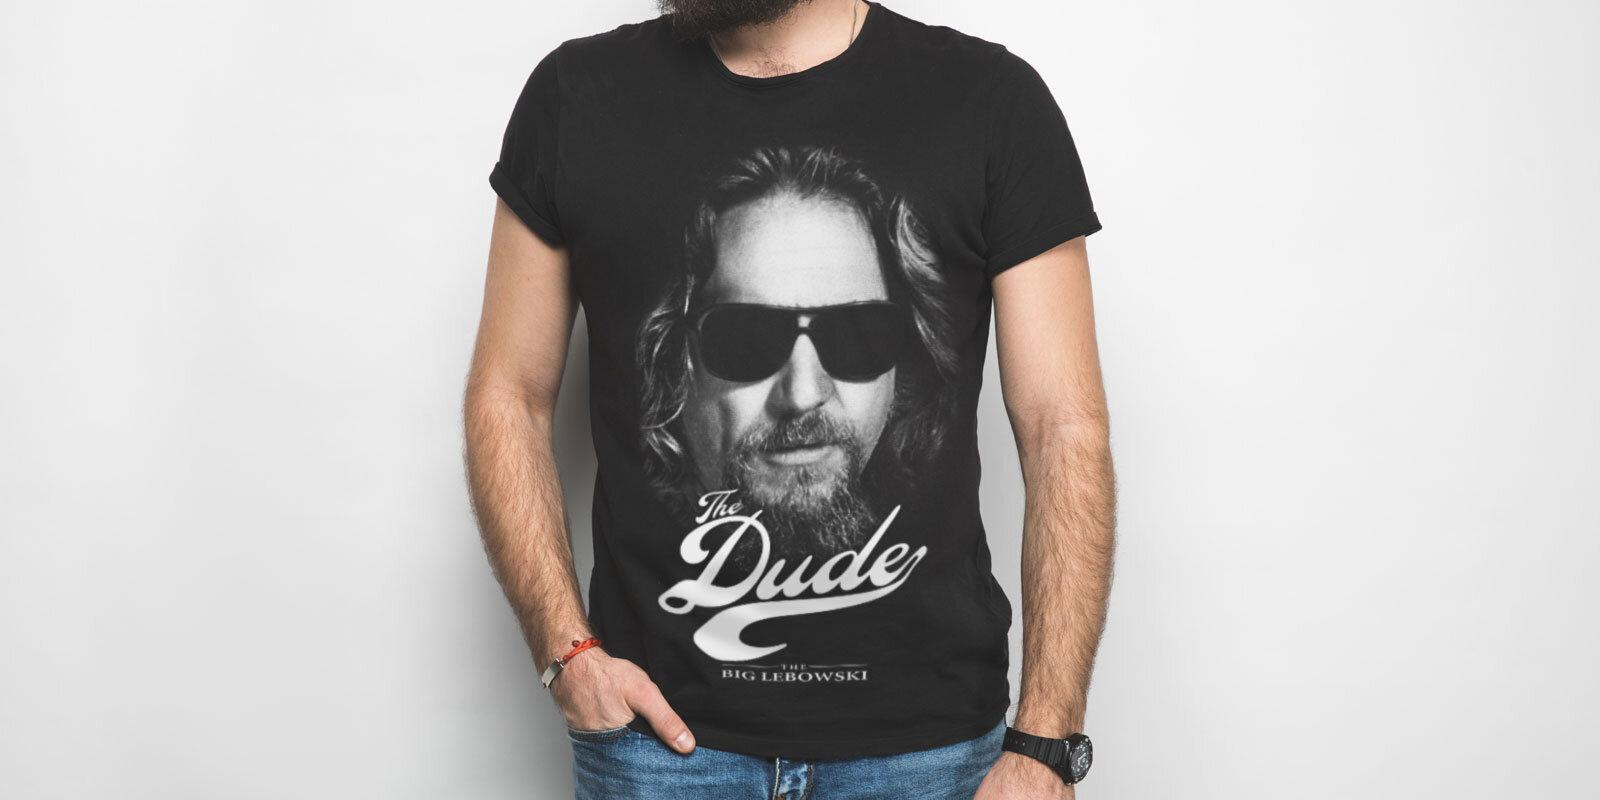 https://www.shirt-store.com/pub_docs/files/Man/MAN-HalfLeft-Lebowski.jpg